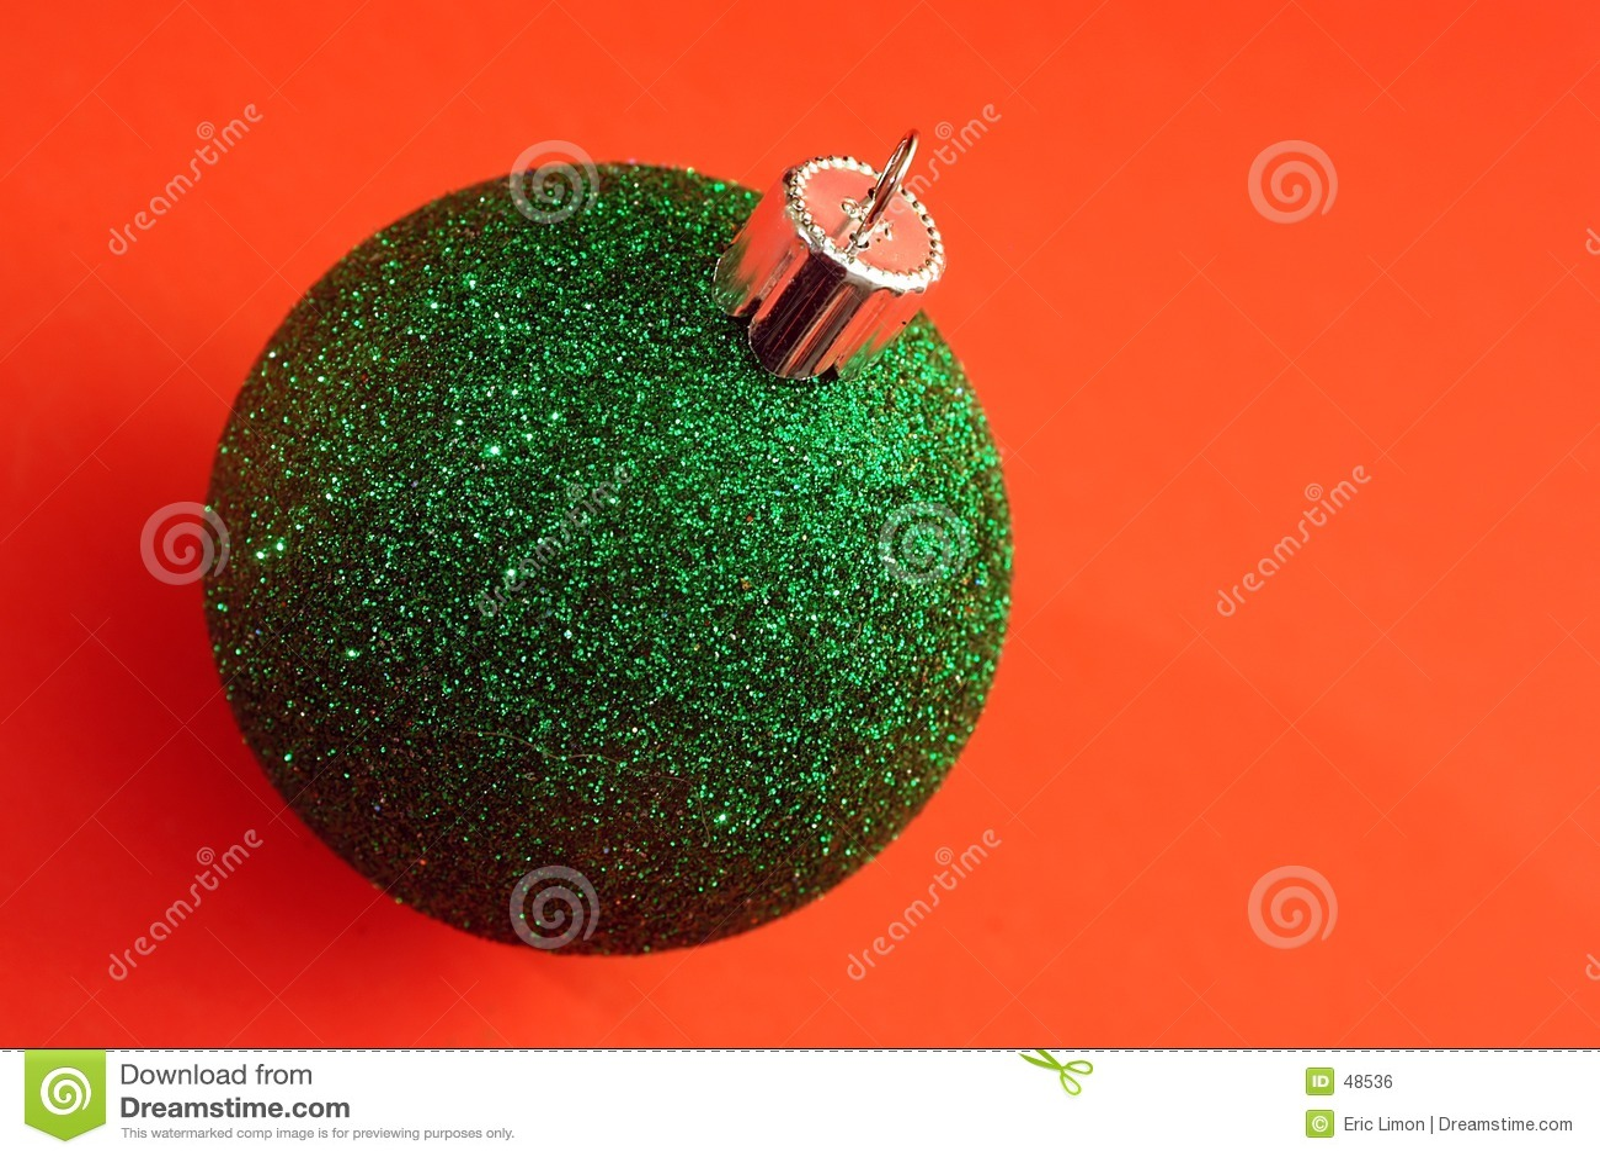 A single green Christmas Ornament